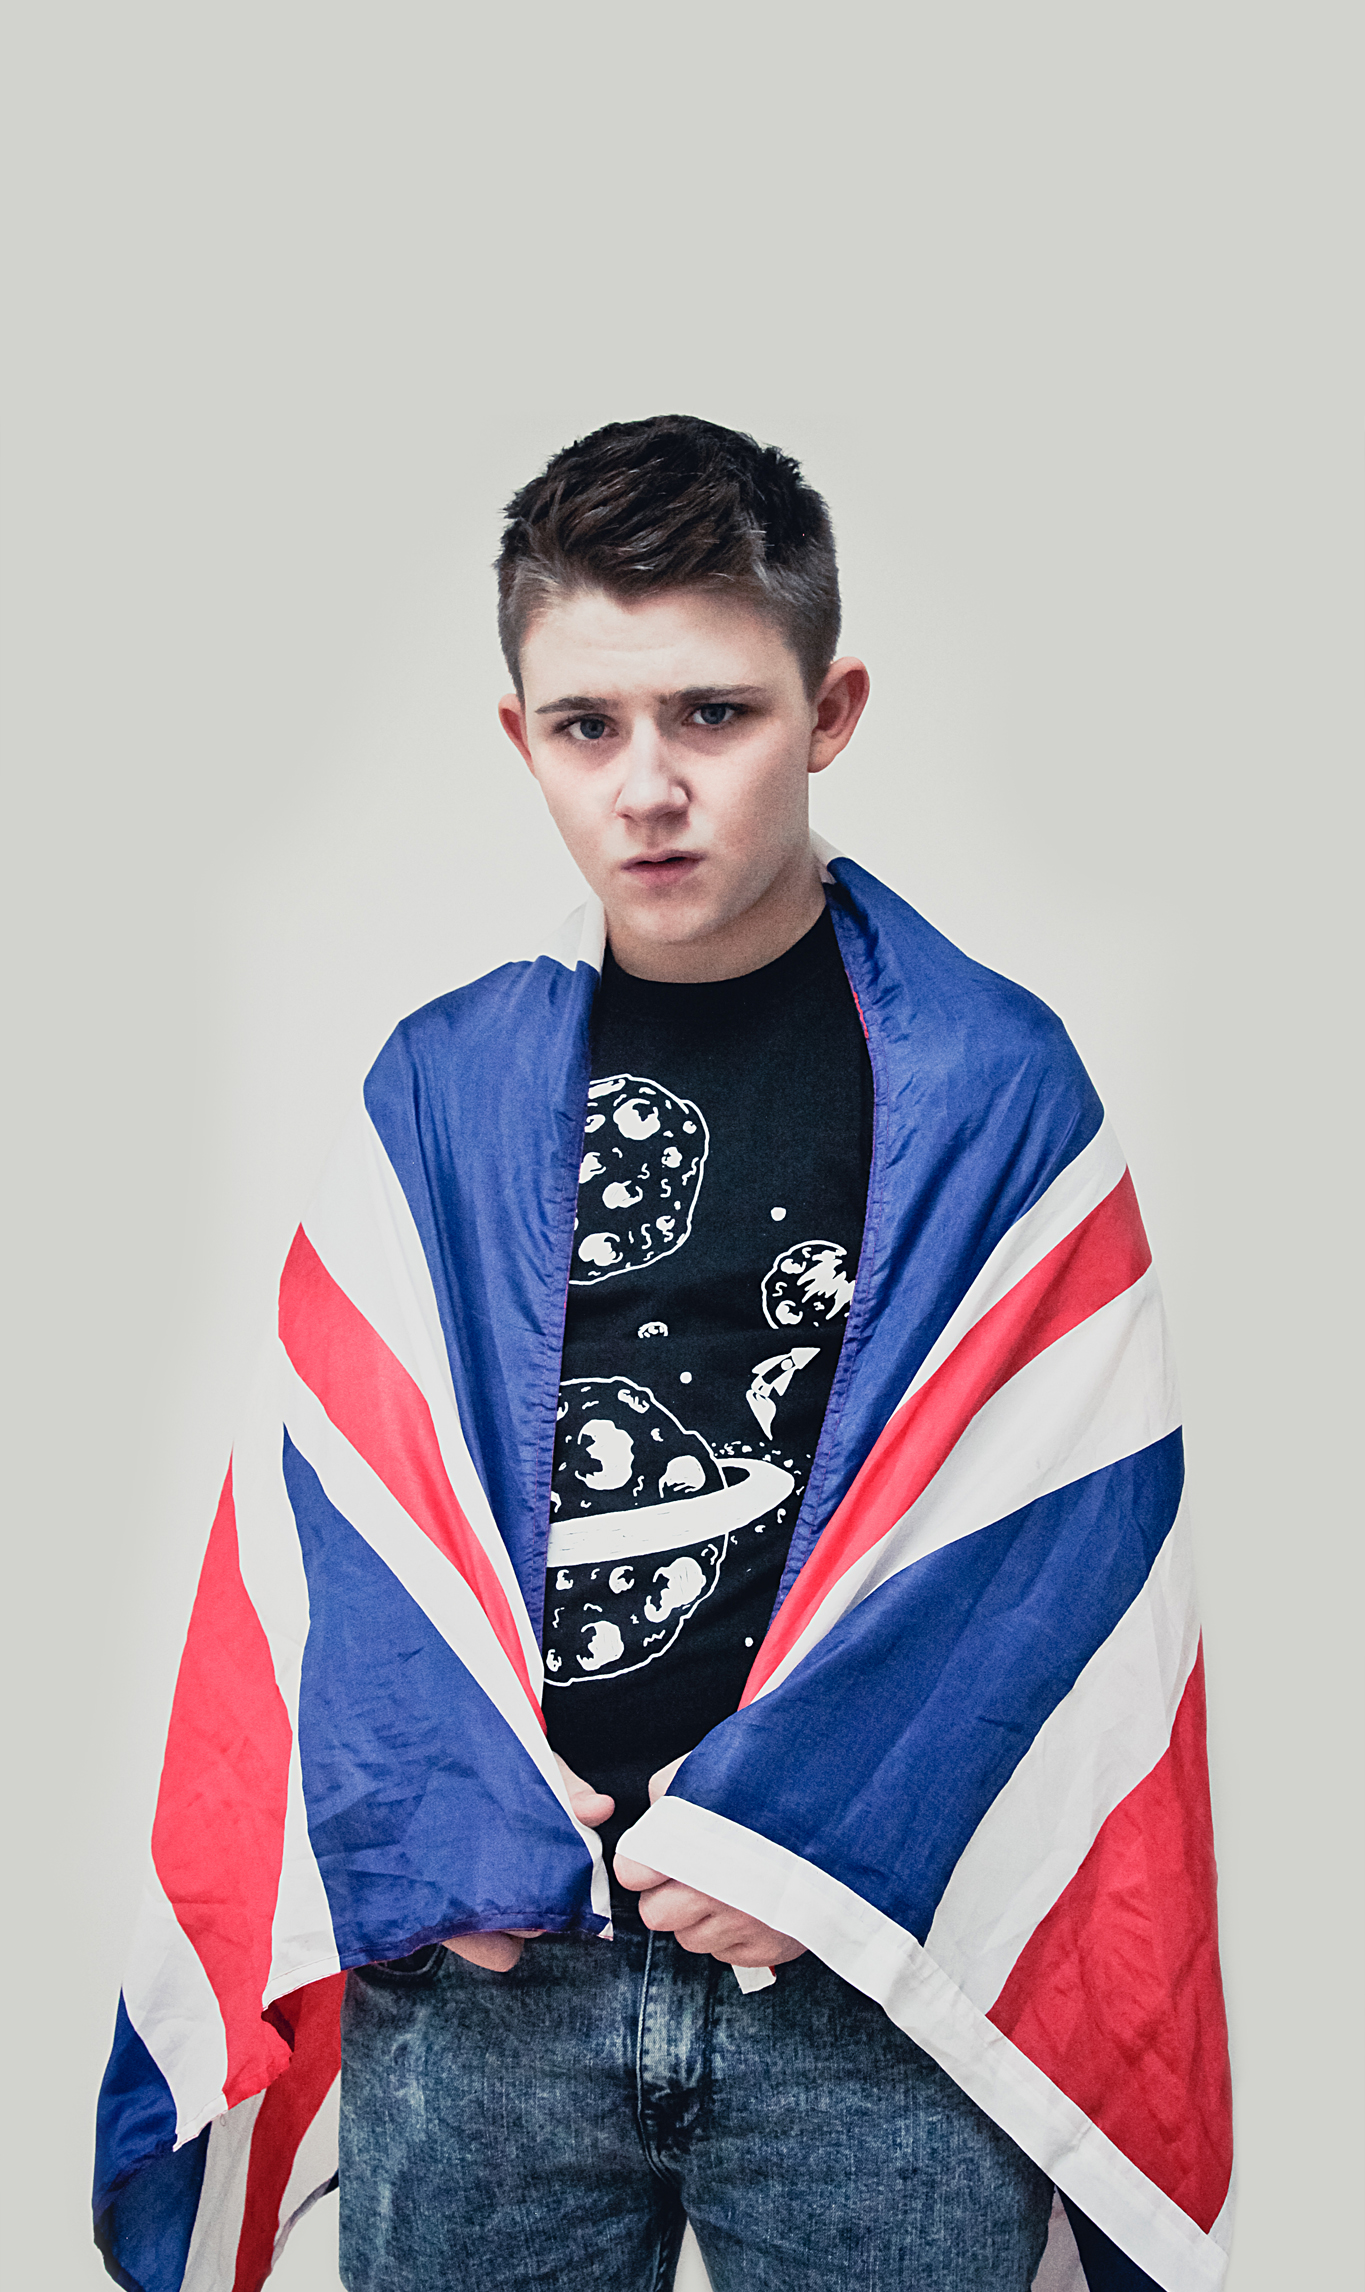 Nicholas McDonald reveals his secret hopes for some X Factor backstage love